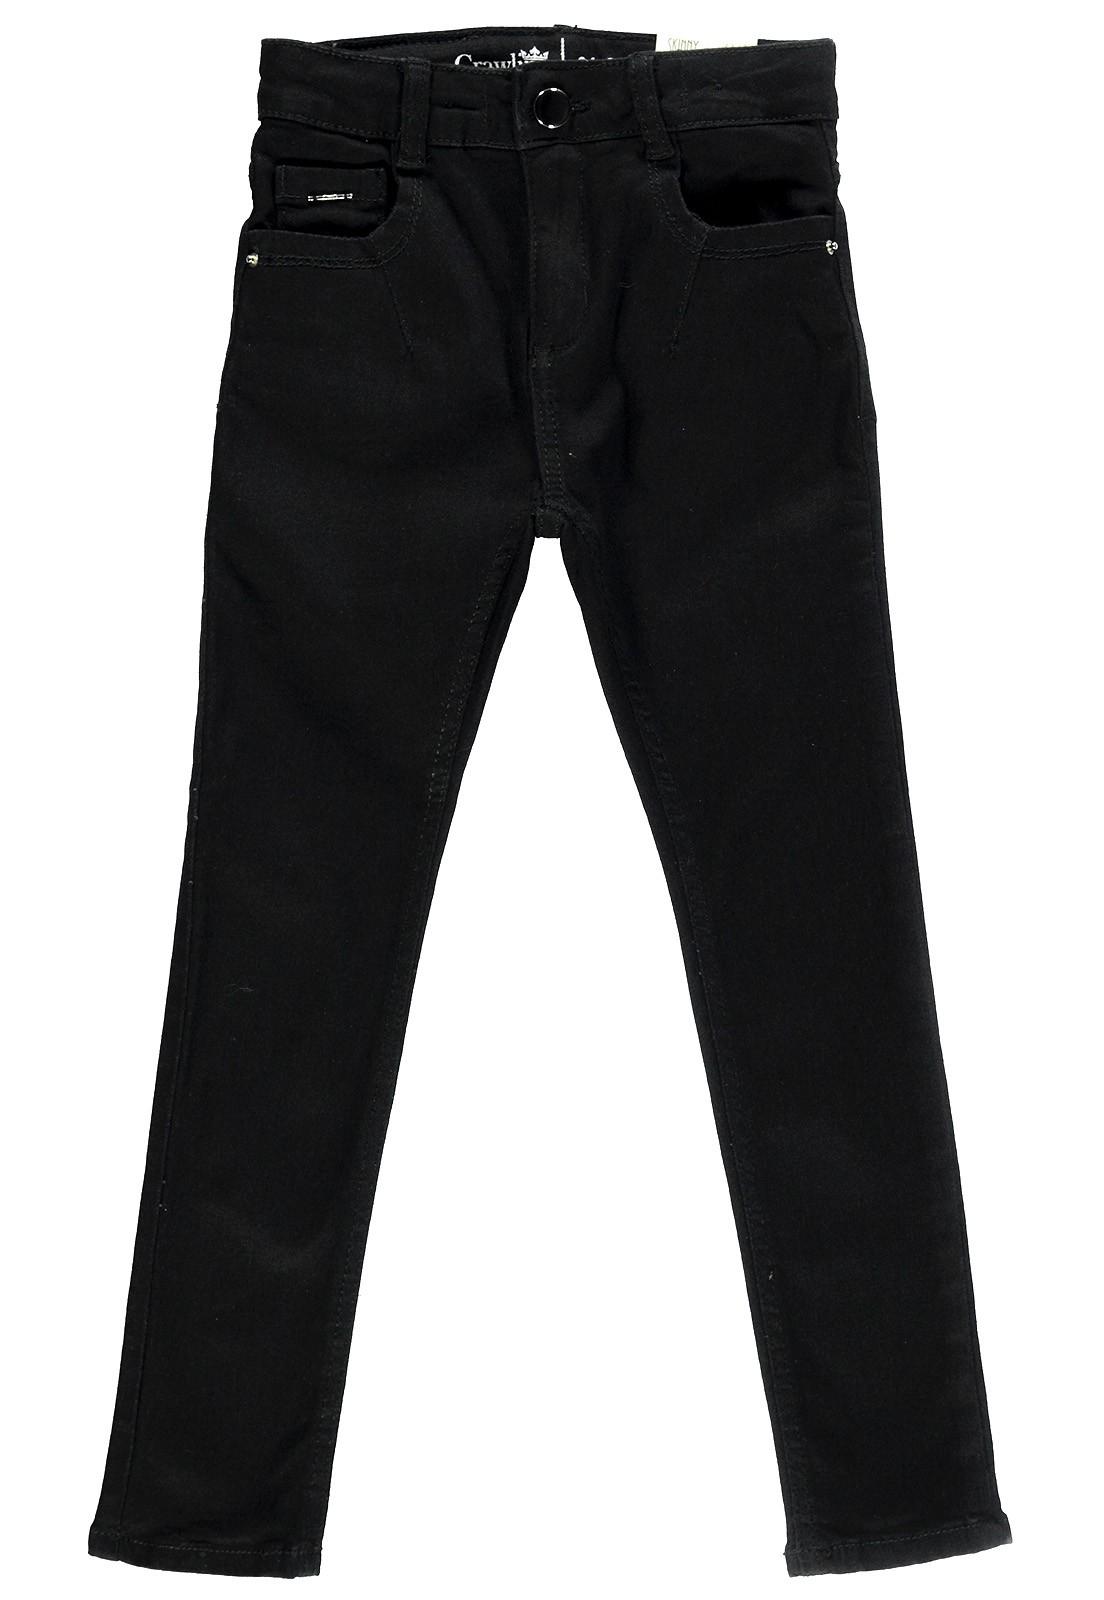 Calça Jeans Feminina Crawling Skinny Preta